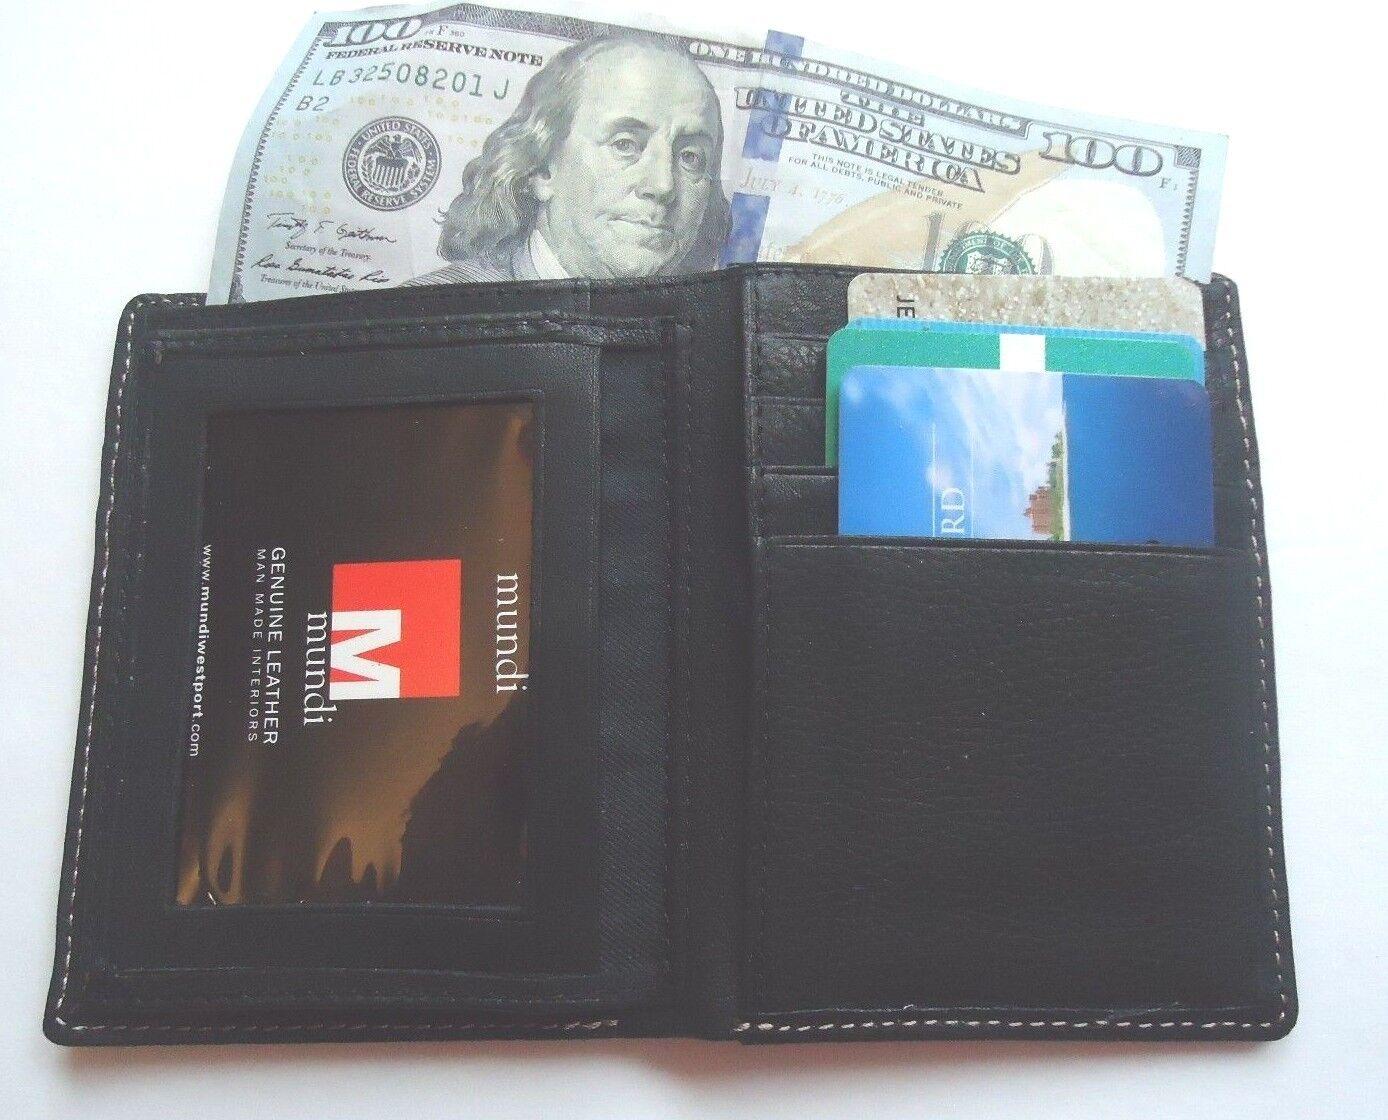 2 Fold Billfold Genuine Leather Wallet,Black,